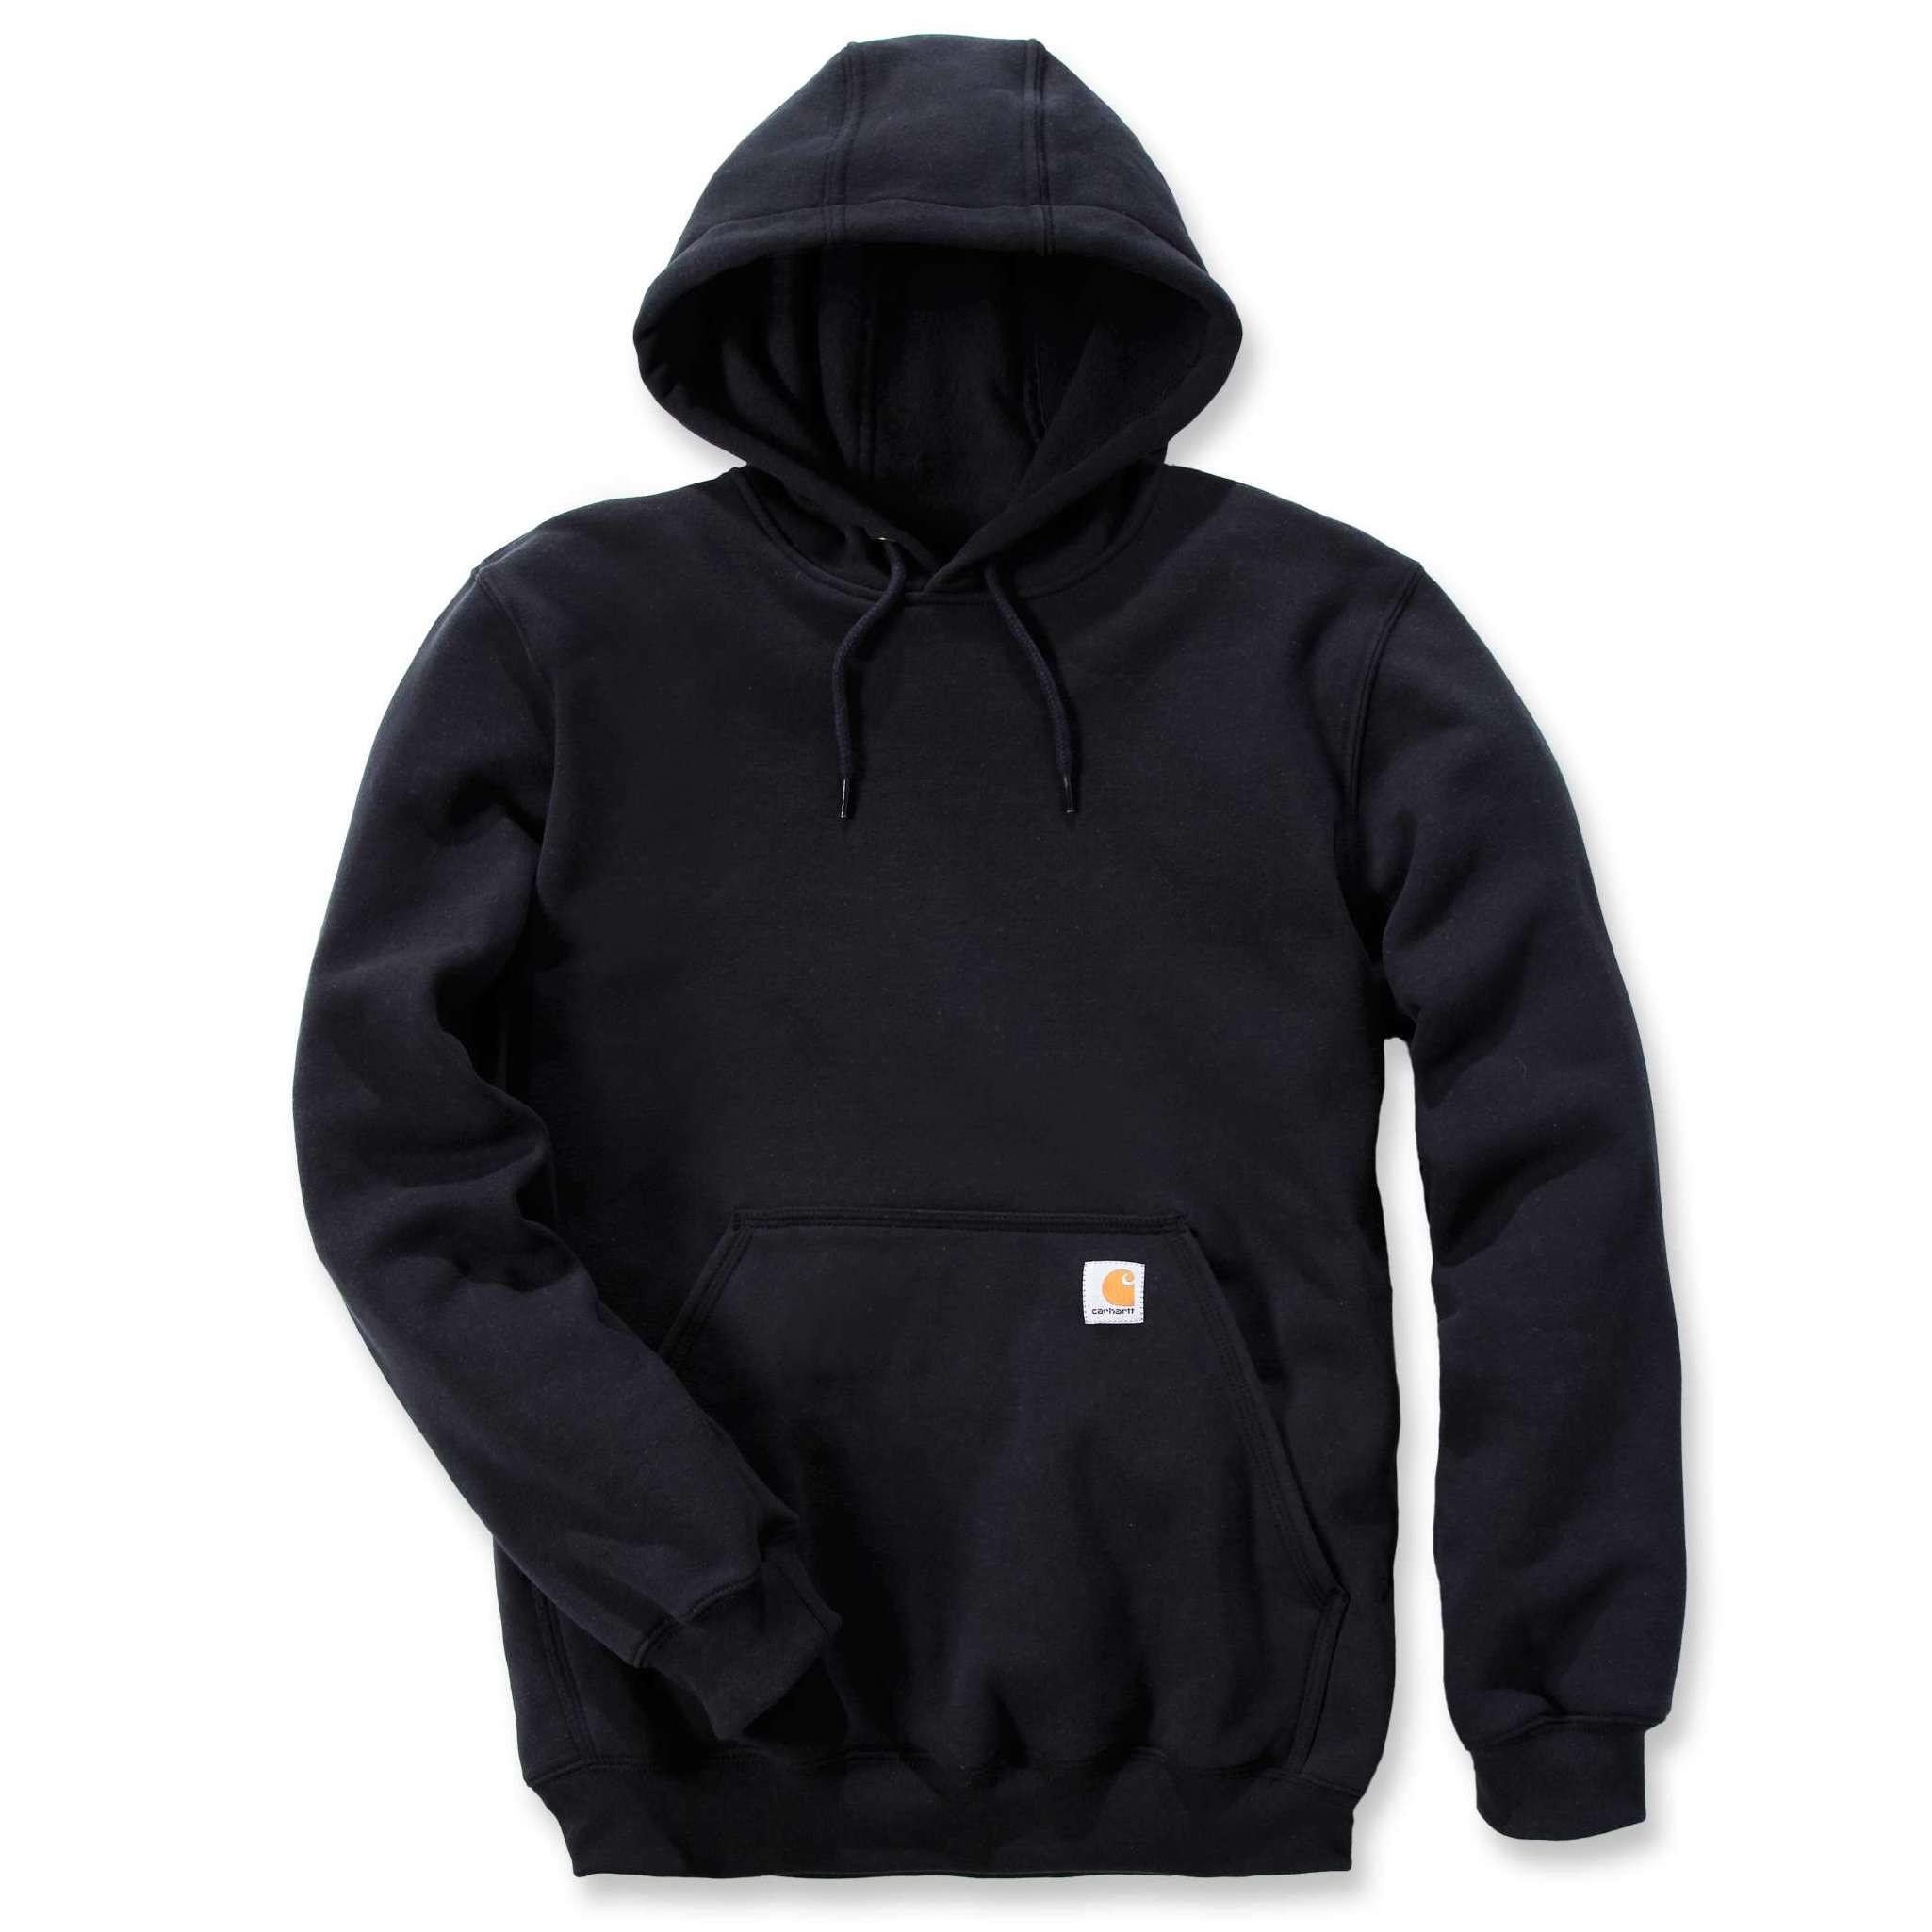 Худи Carhartt Hooded Sweatshirt K121 (Black)